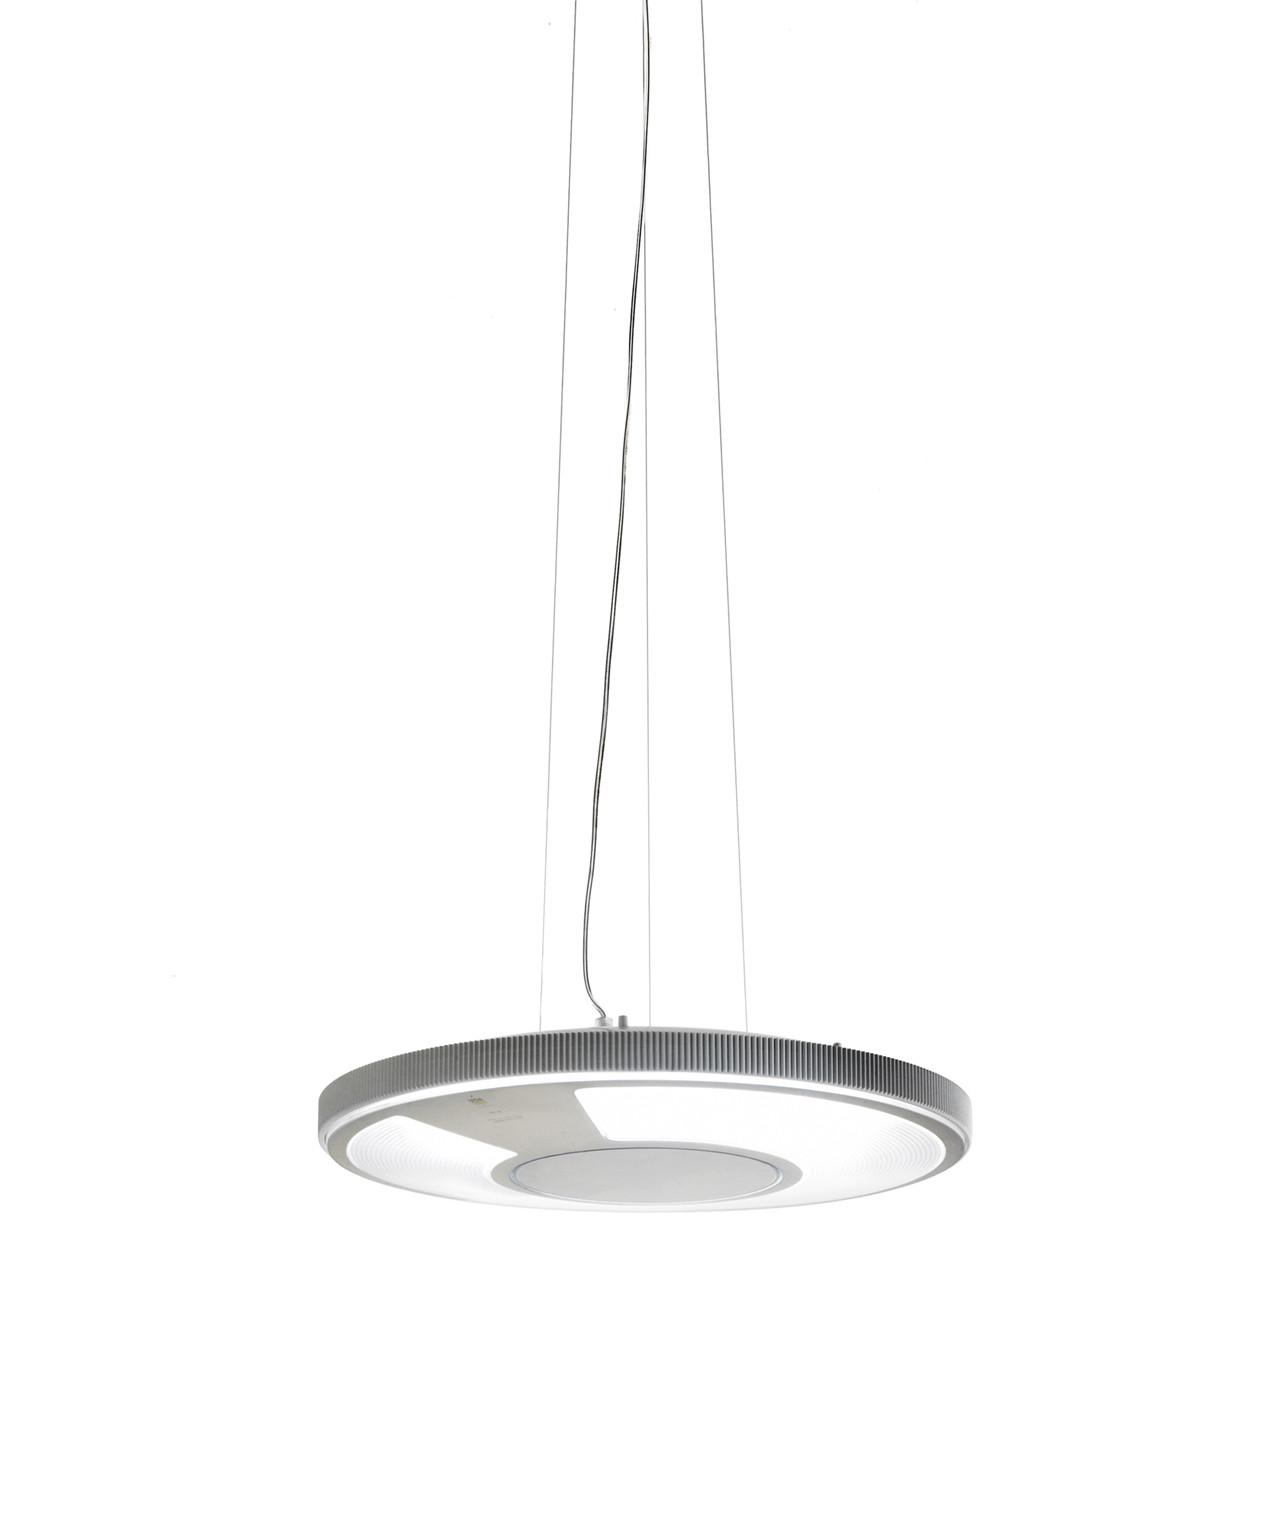 LightDisc Pendel - Luceplan